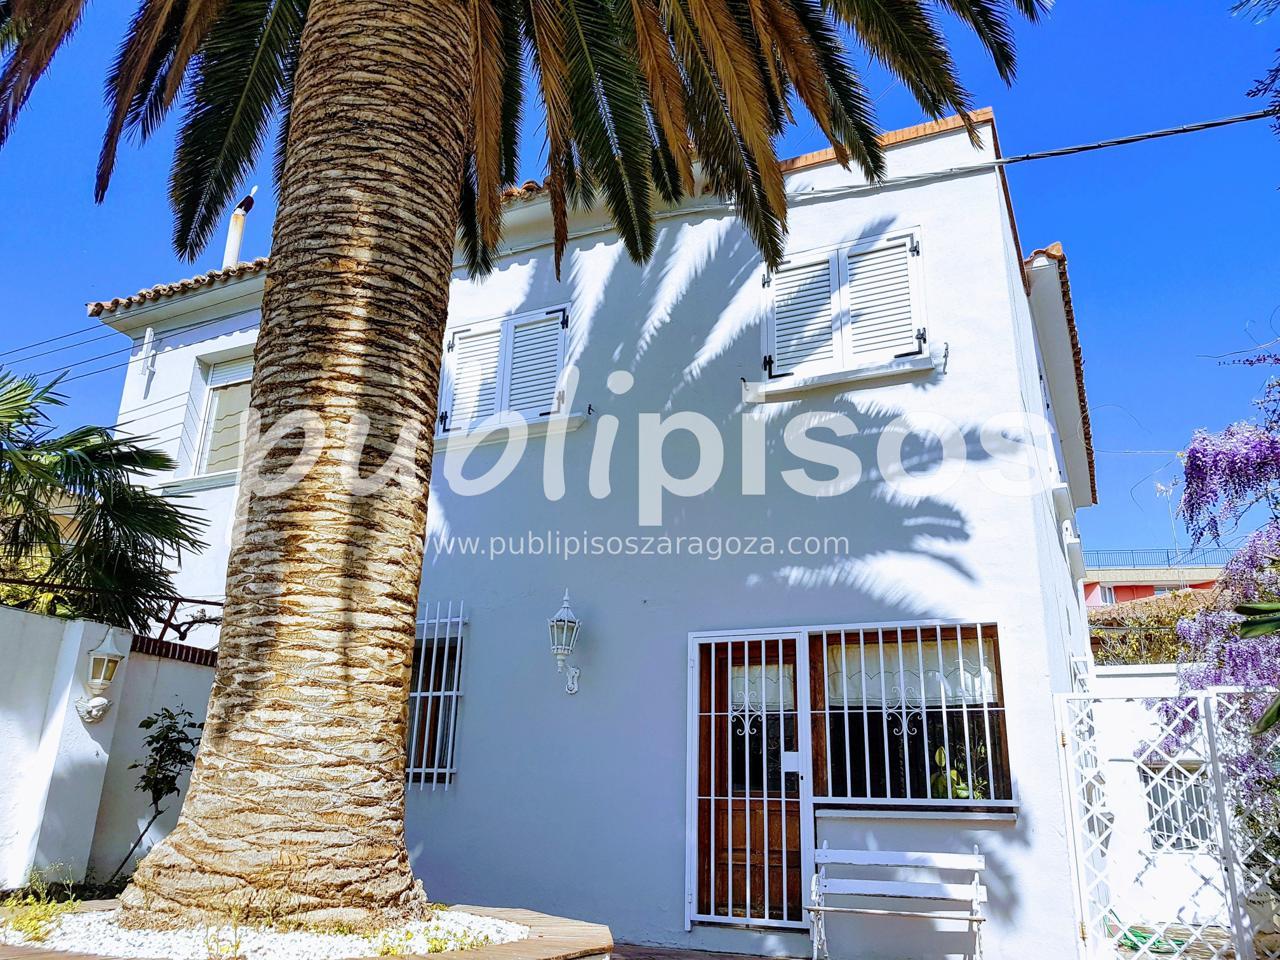 Chalet en alquiler Ruiseñores centro Zaragoza-12